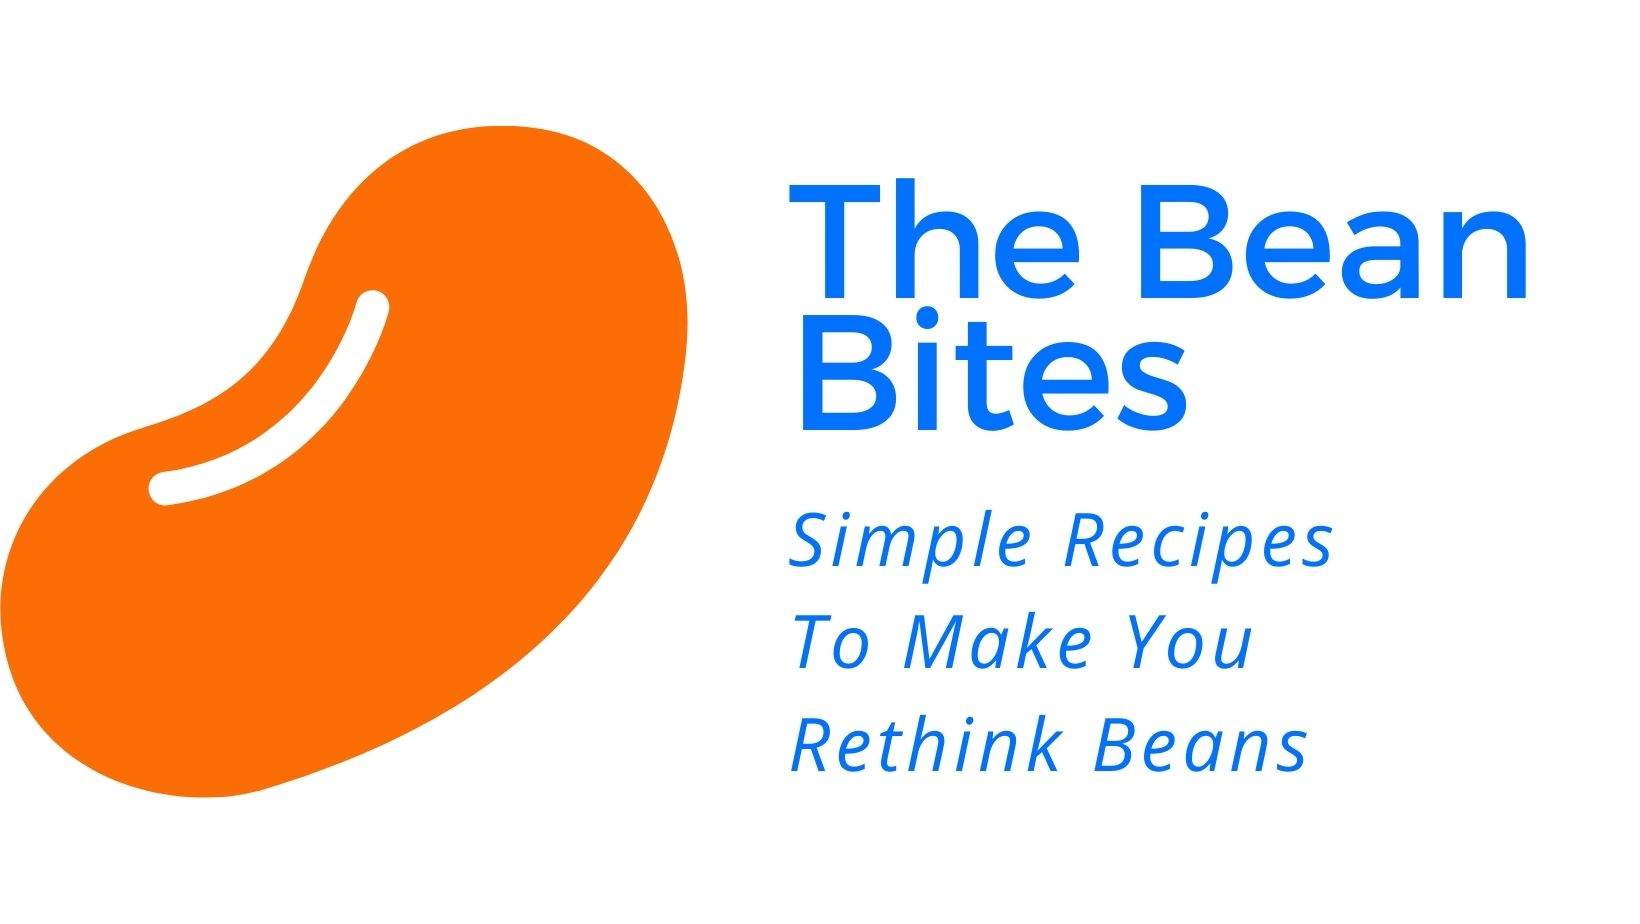 The Bean Bites